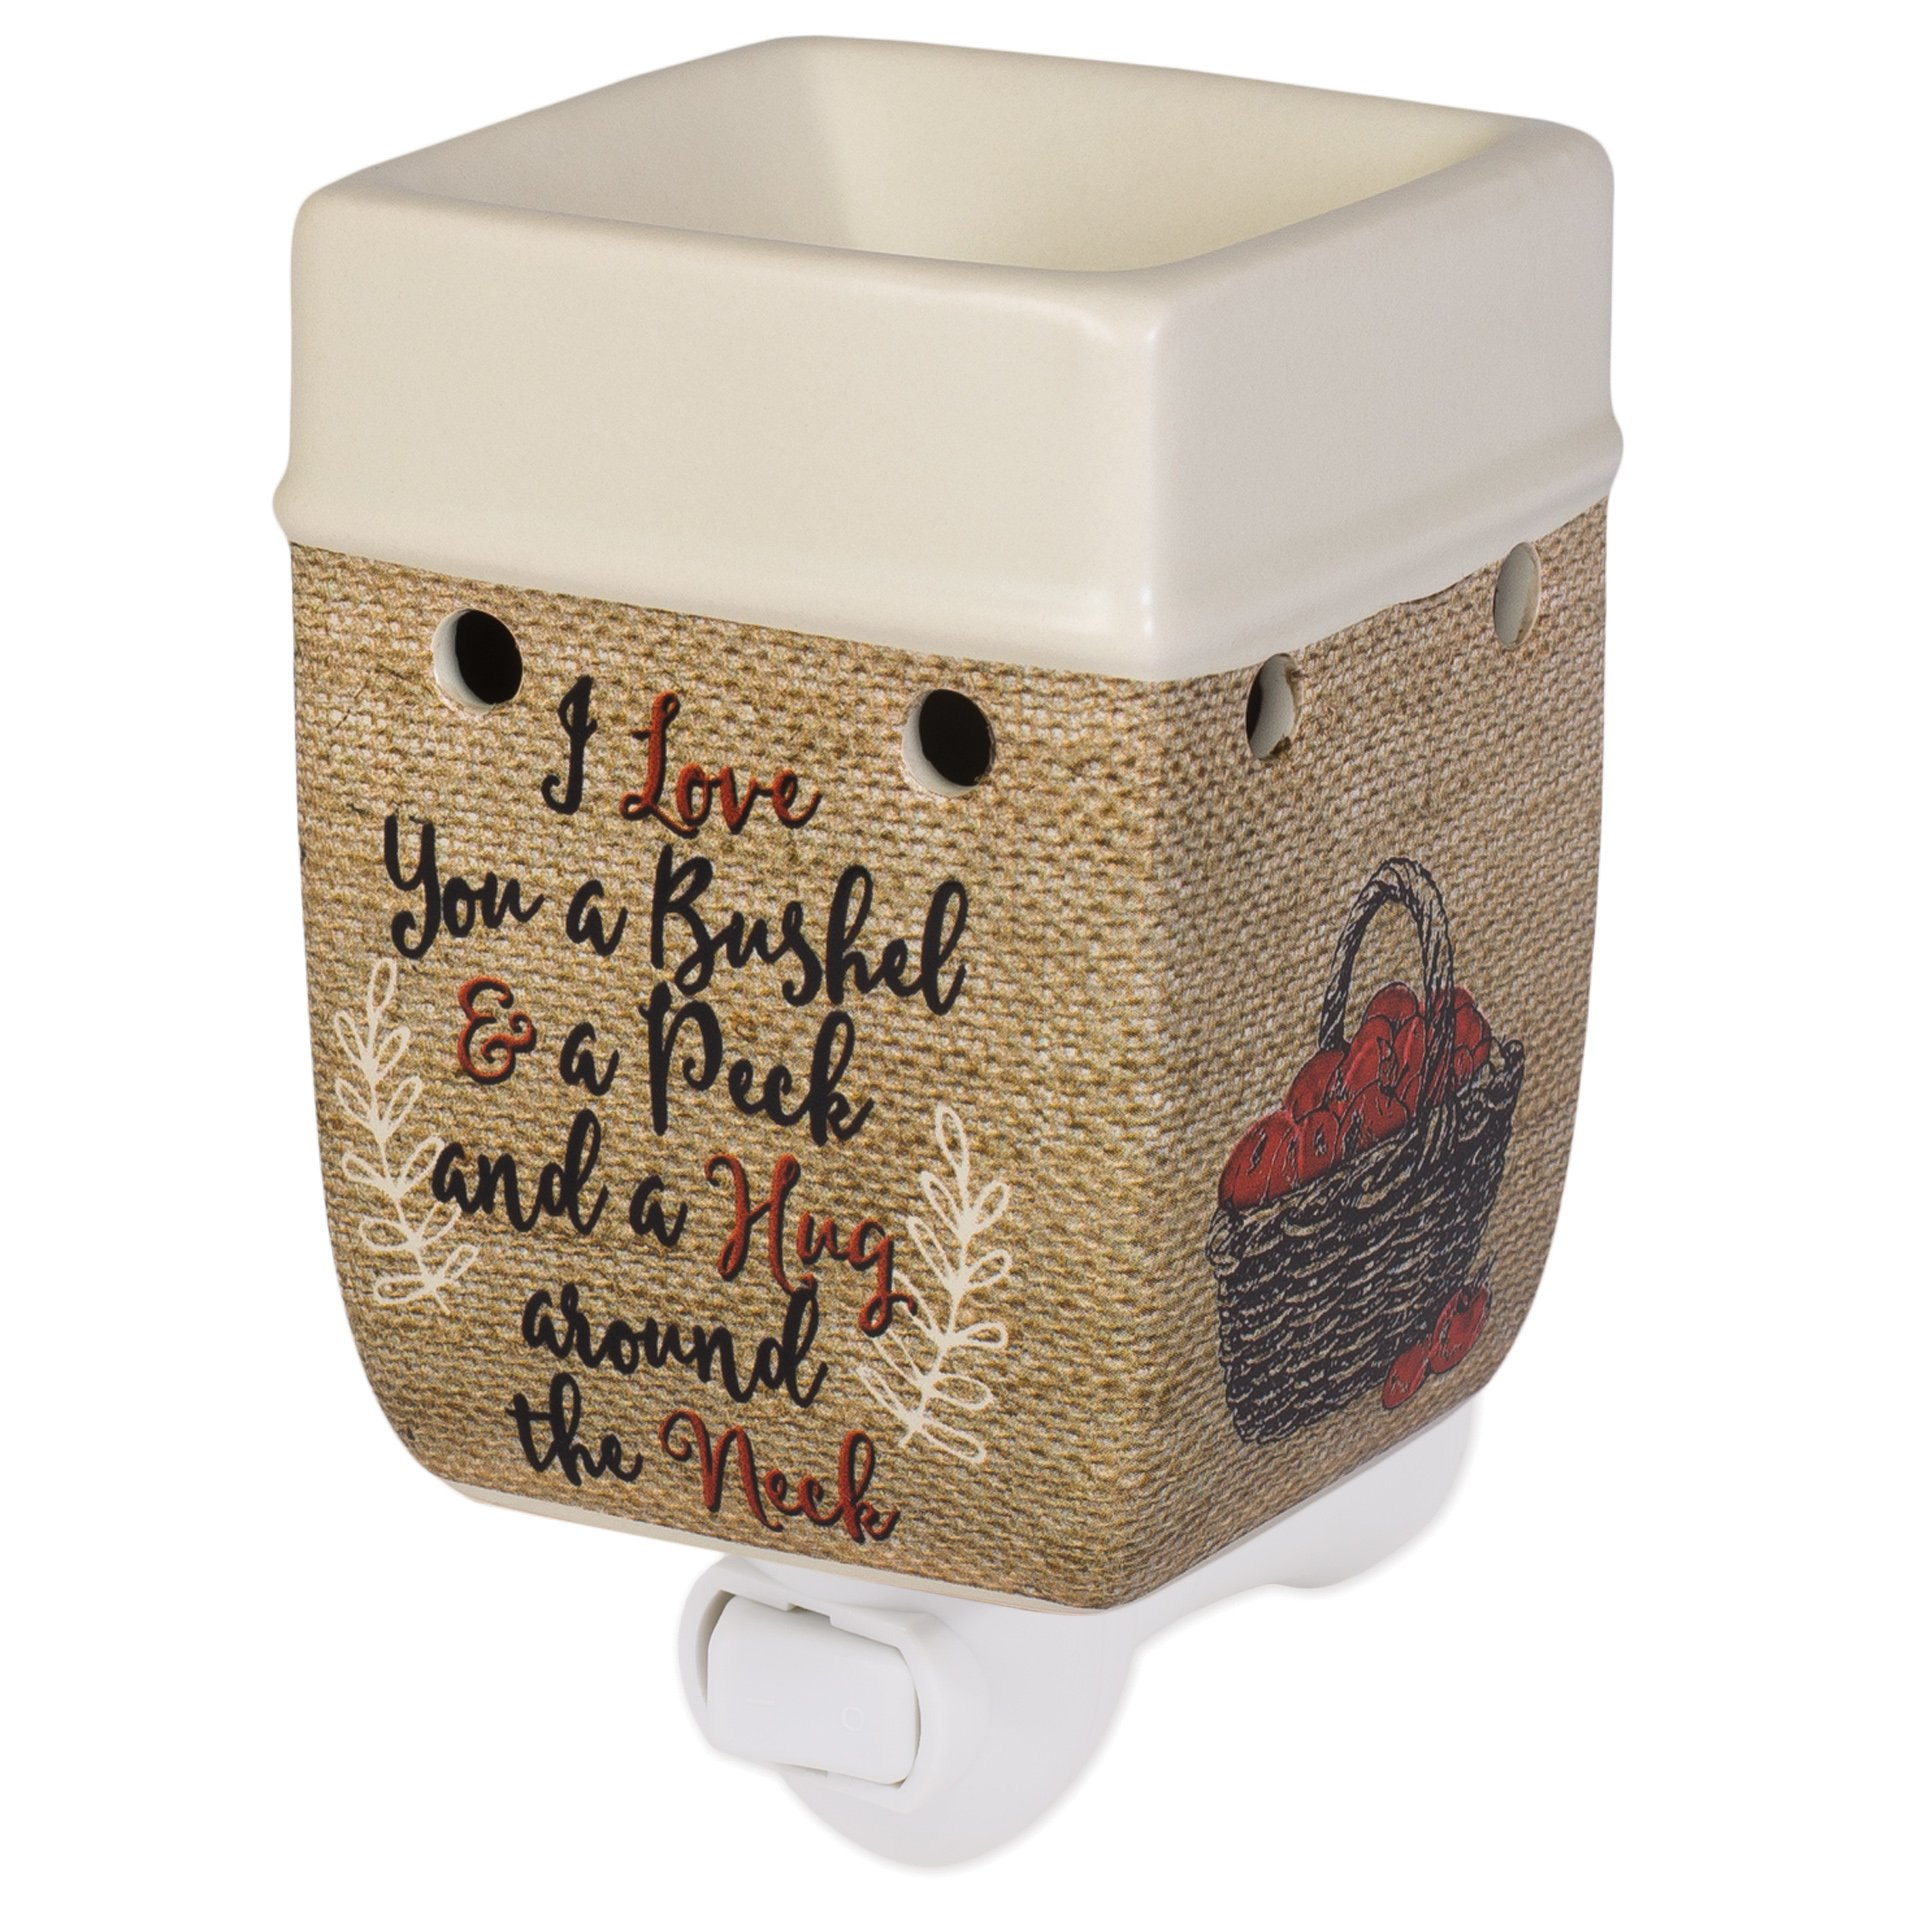 Elanze Designs I Love You A Bushel A Peck Burlap Apples Cream Ceramic Stone Plug-in Warmer